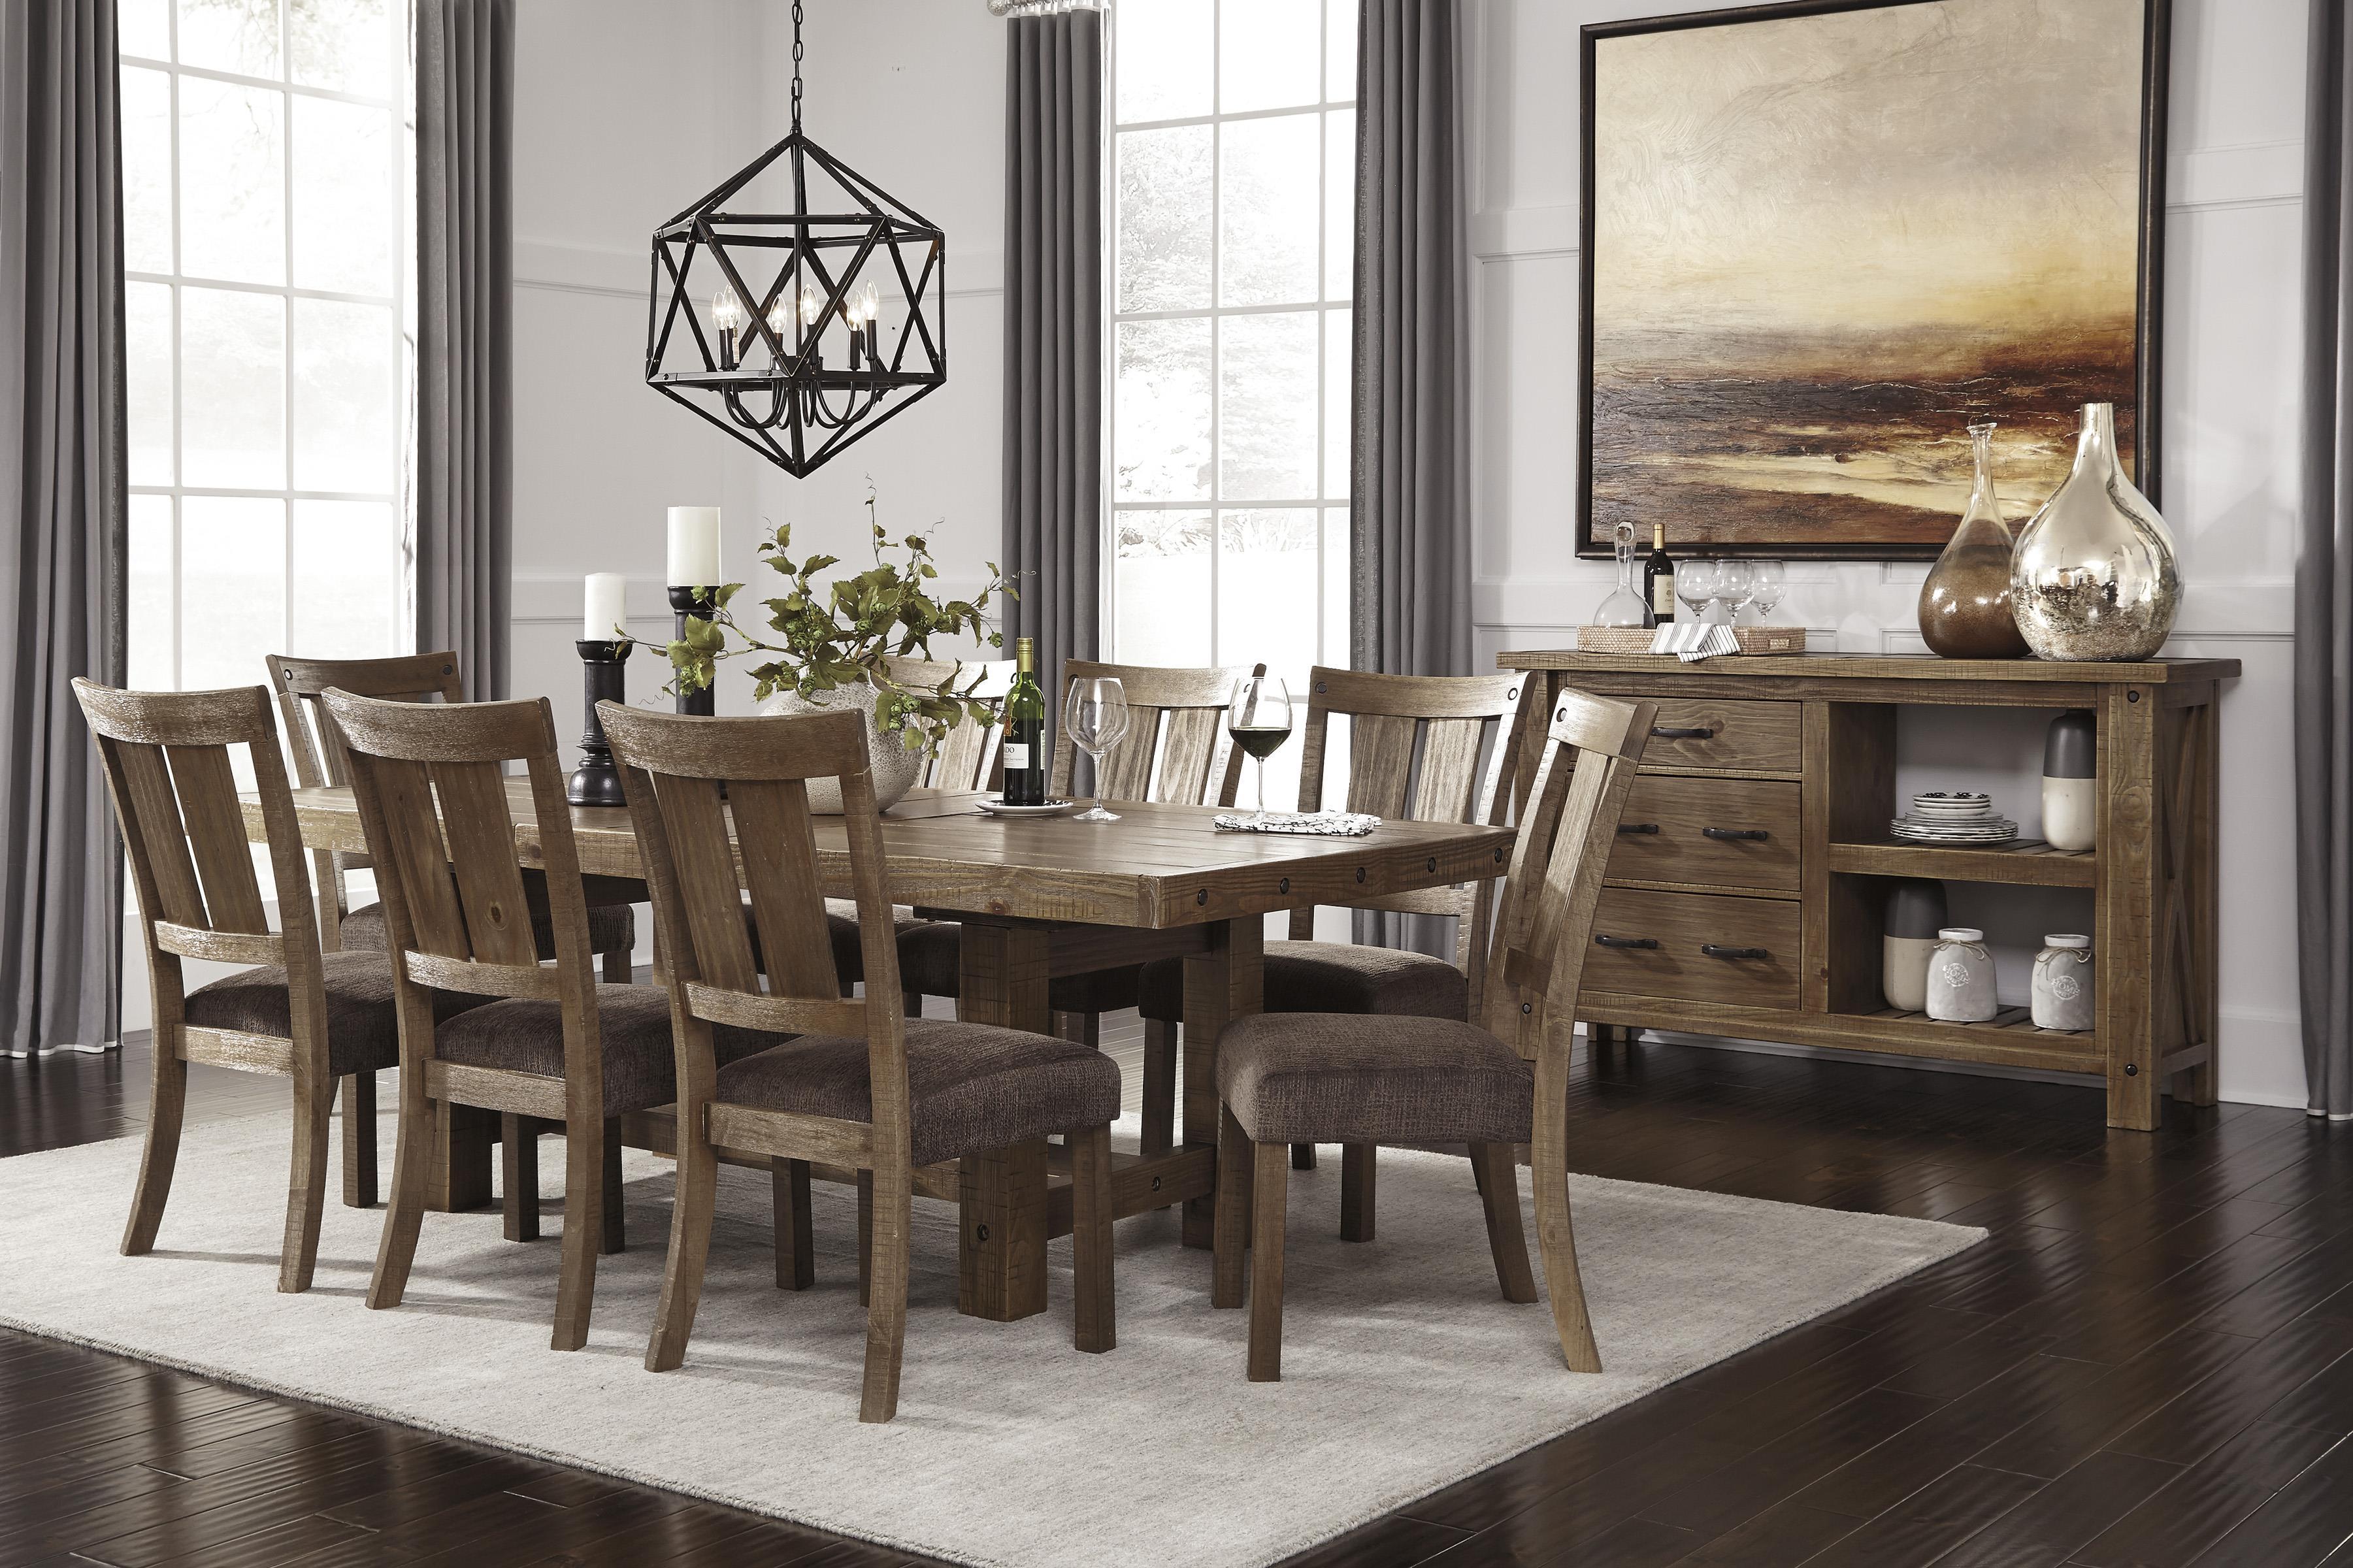 Signature design by ashley tamilo rectangle dining room for Ashley furniture dining room table